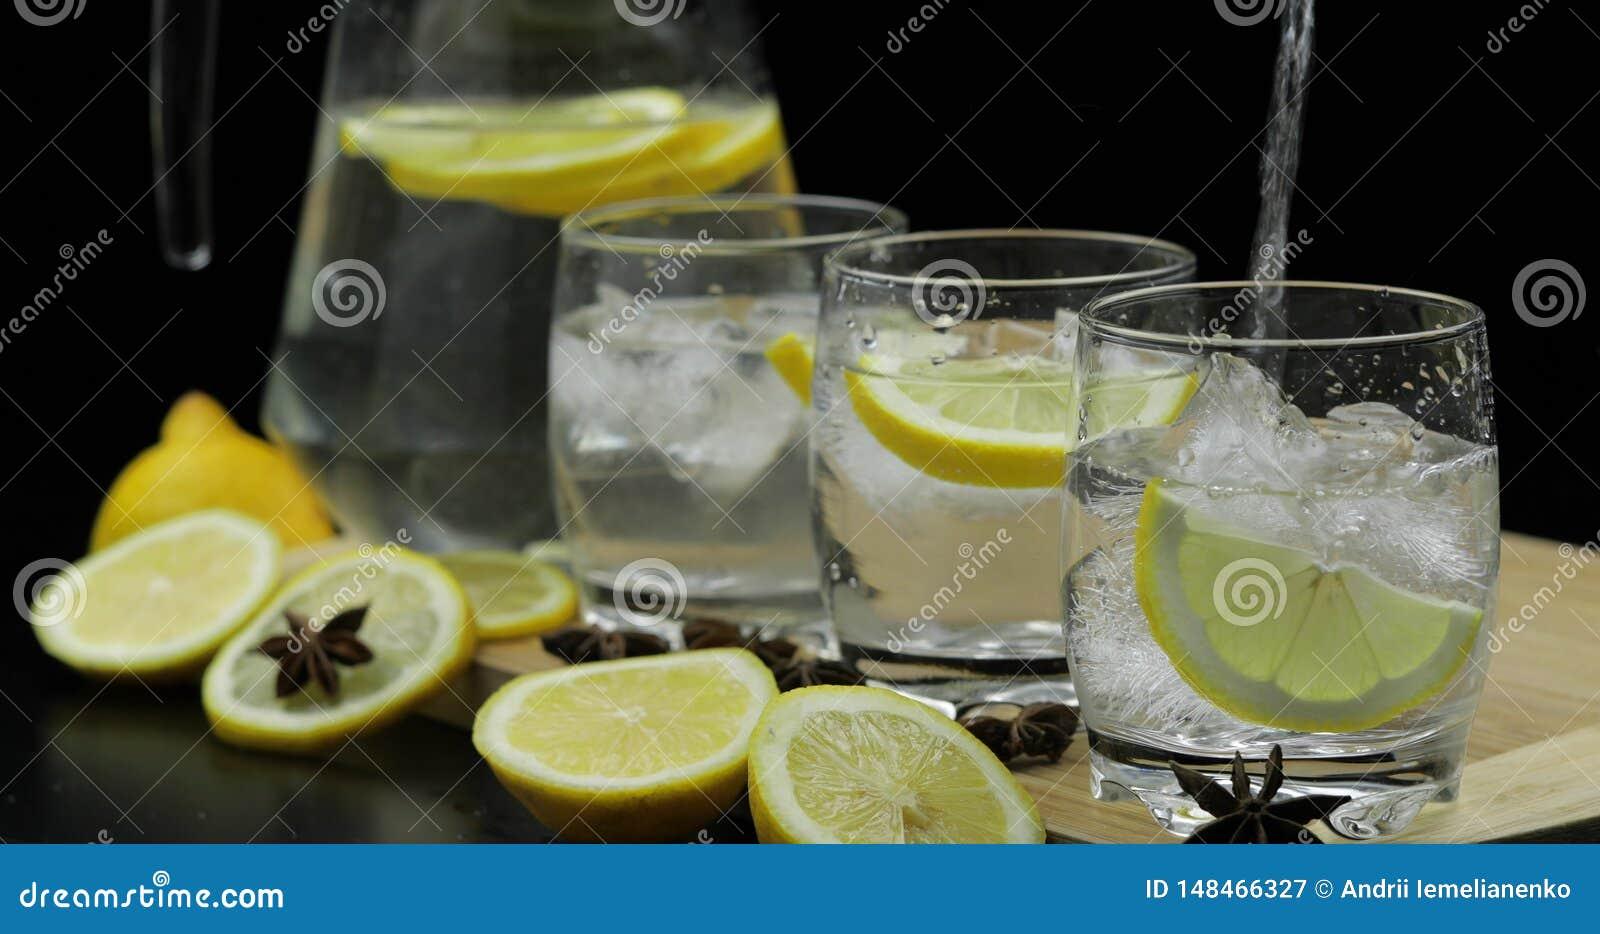 Pour lemon juice into glass with ice and lemon slices. Lemon alcoholic cocktail